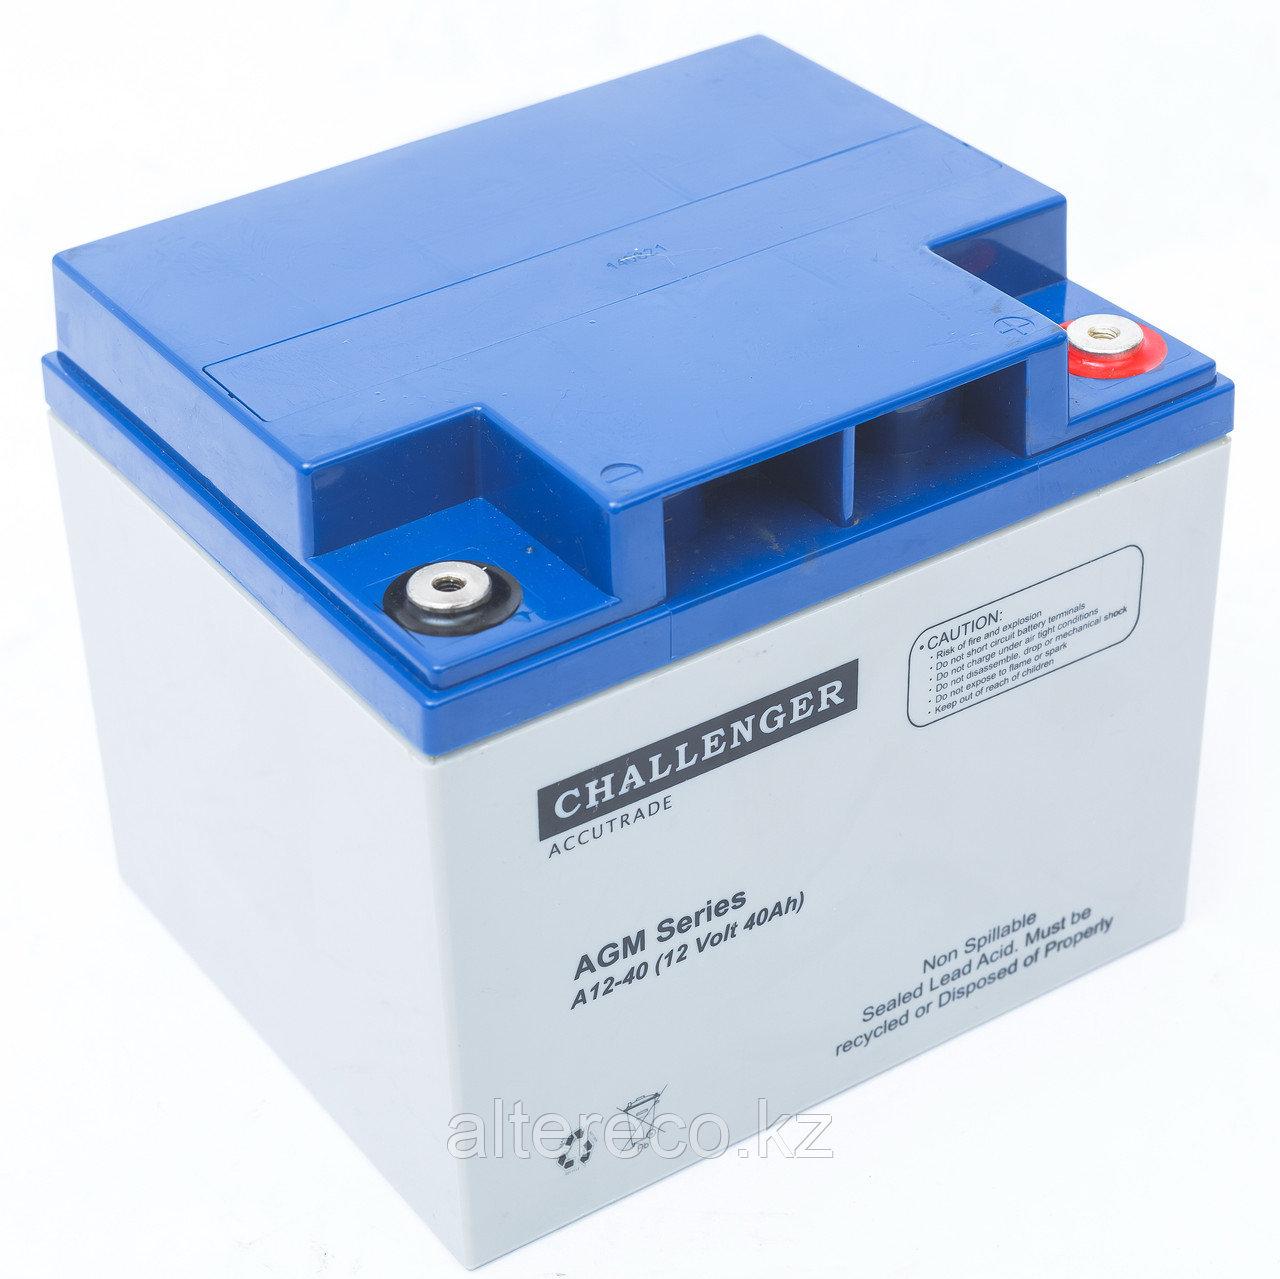 Аккумулятор Challenger A12-40 (12В, 40Ач)